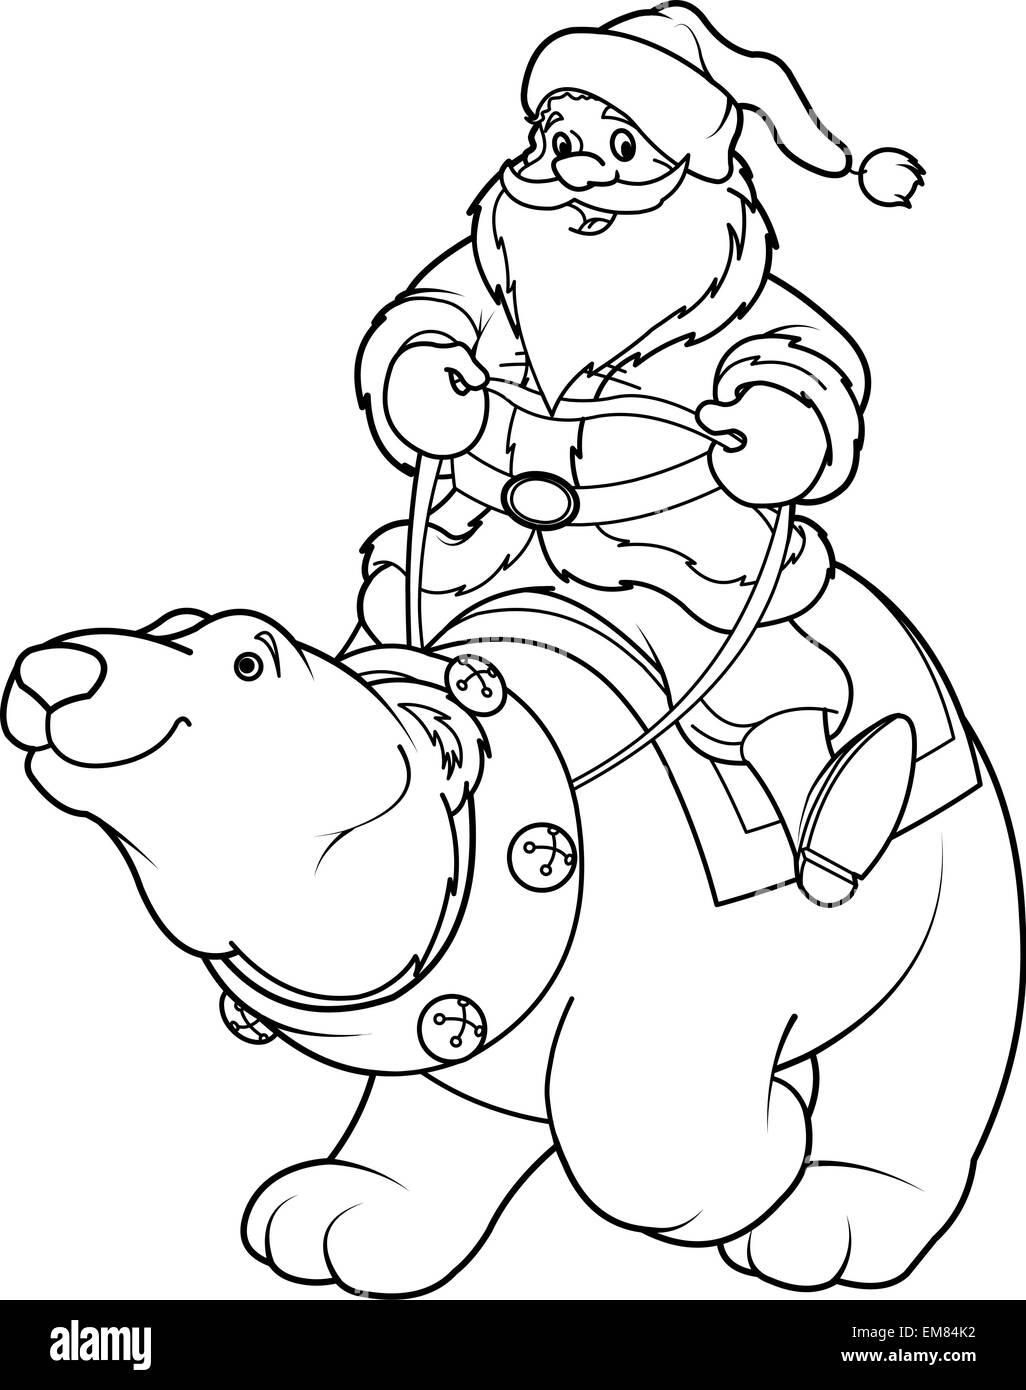 - Santa Claus Riding On Polar Bear Coloring Page Stock Vector Image